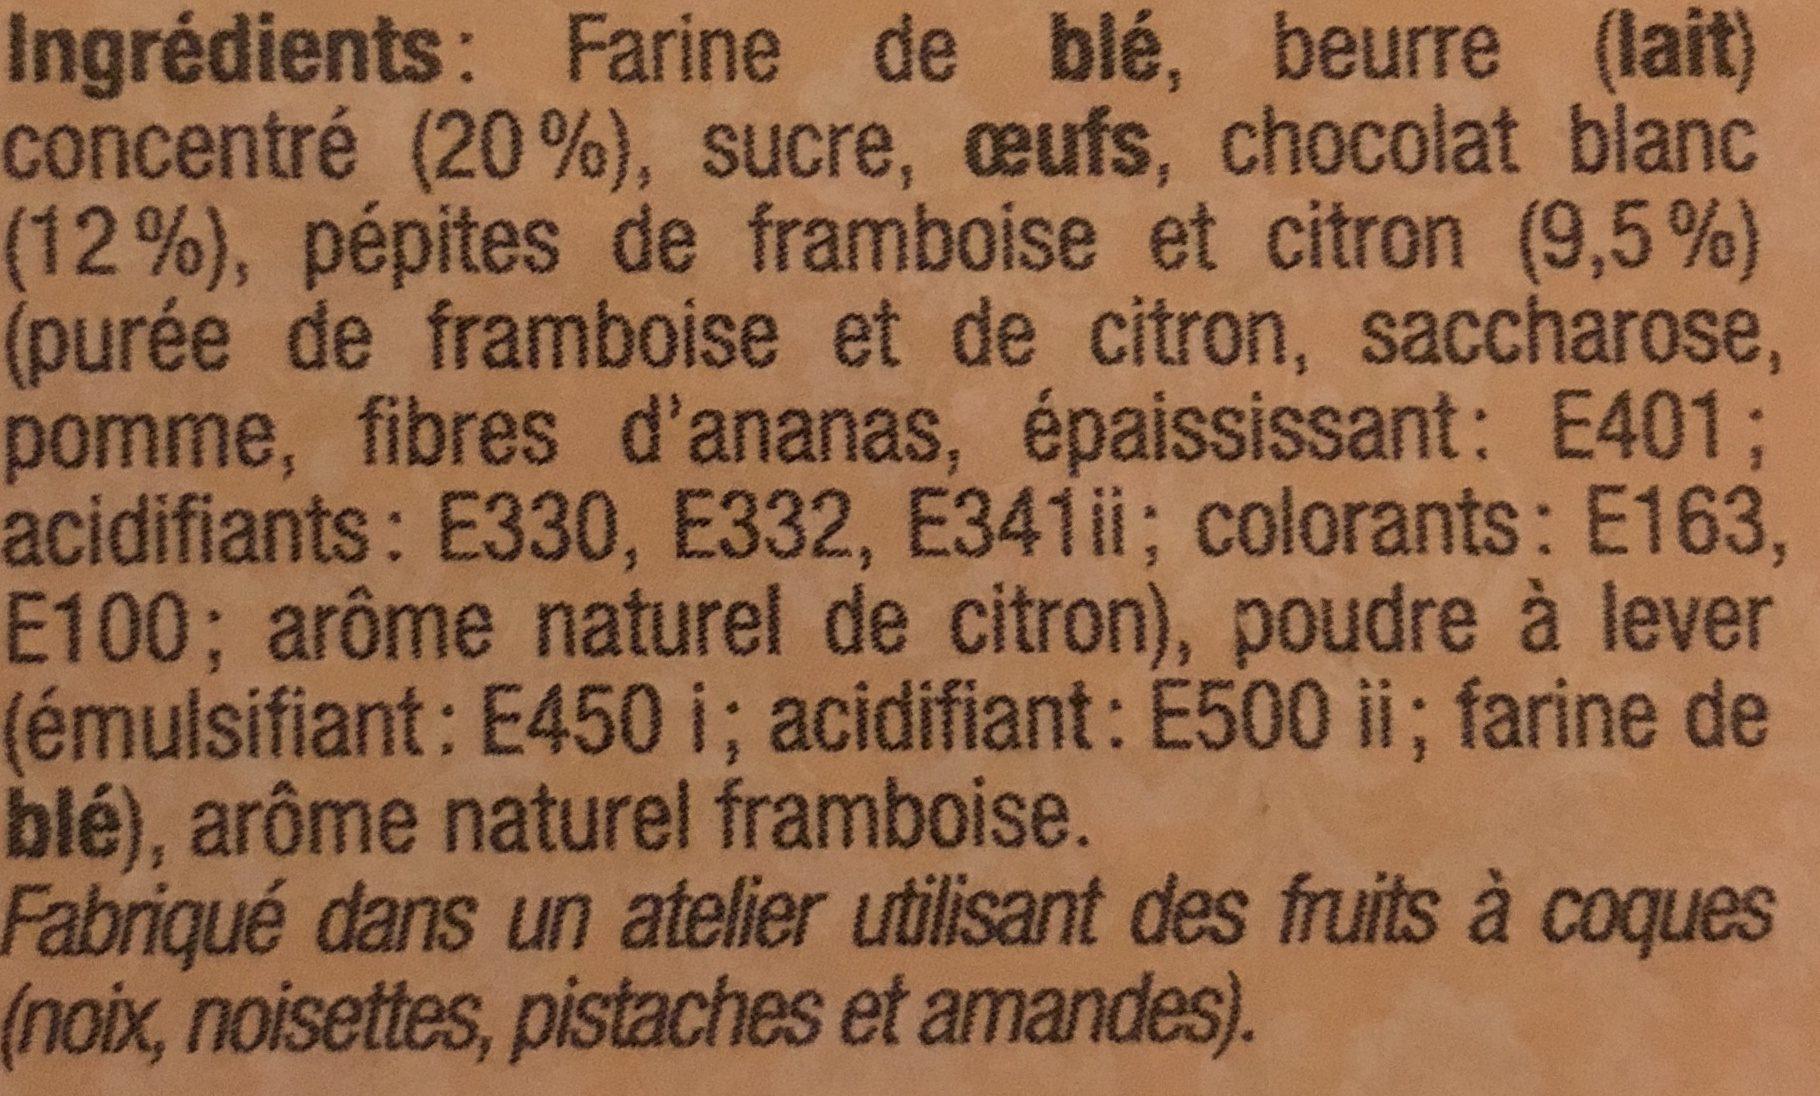 Palets Chocolat blanc Framboise - Ingrédients